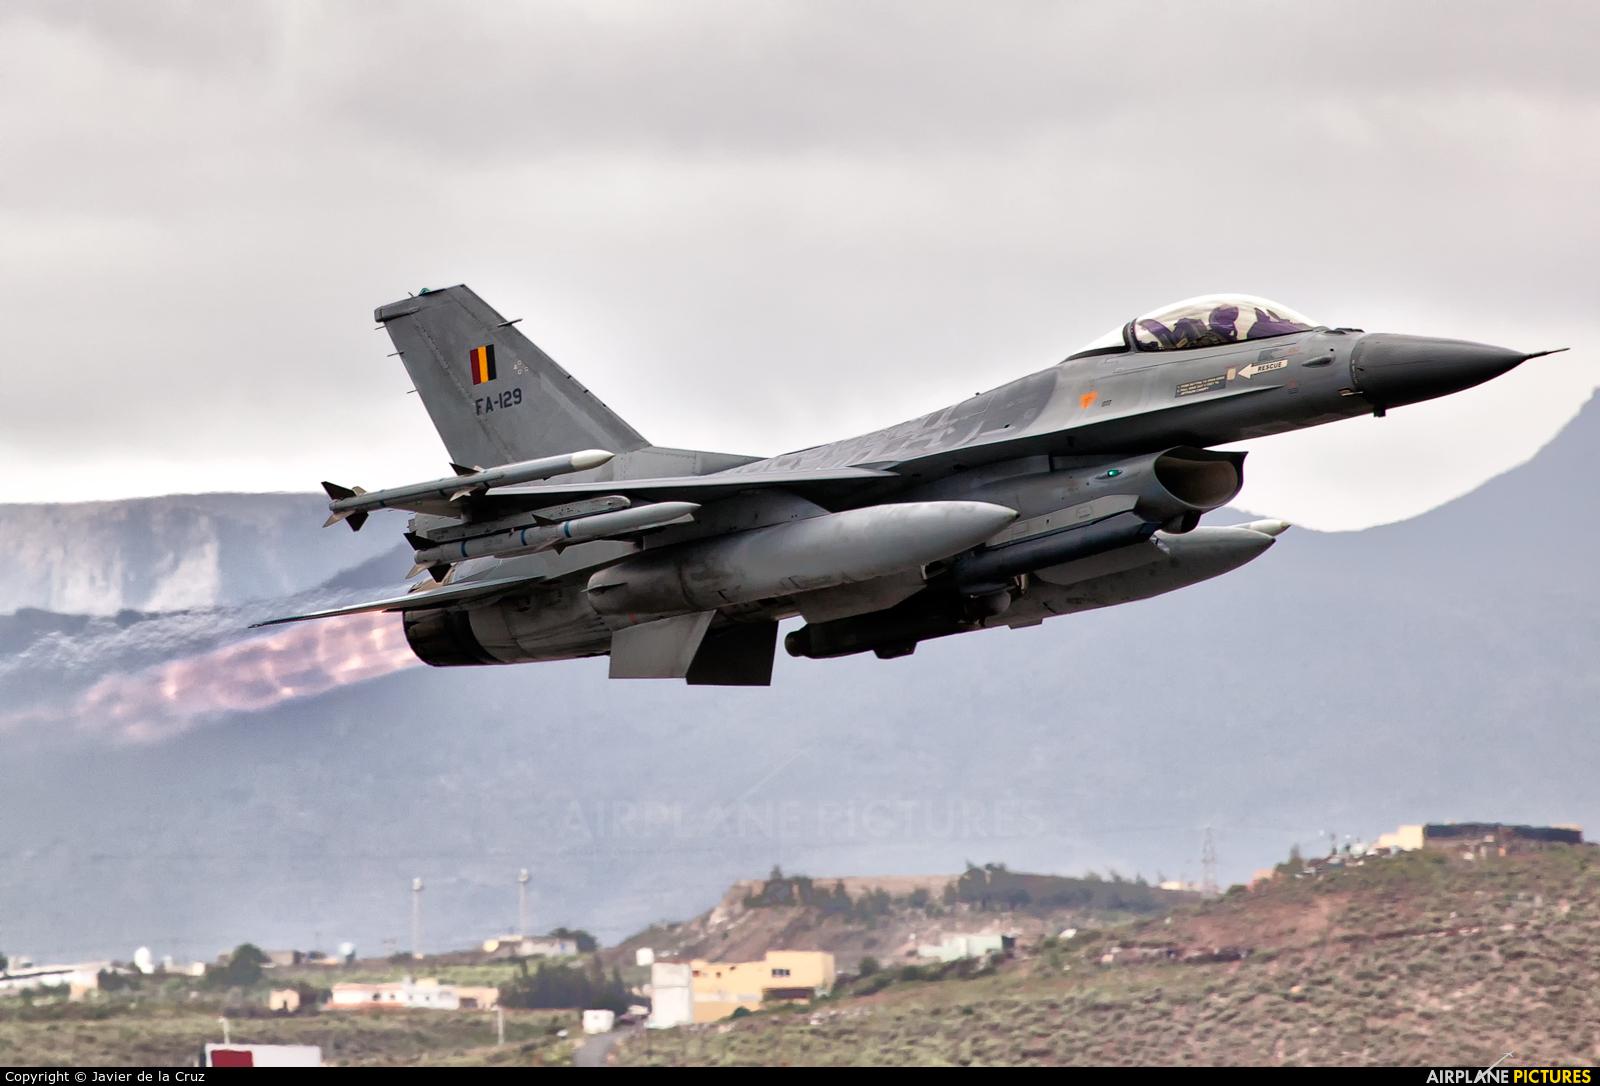 Belgium - Air Force FA-129 aircraft at Las Palmas de Gran Canaria